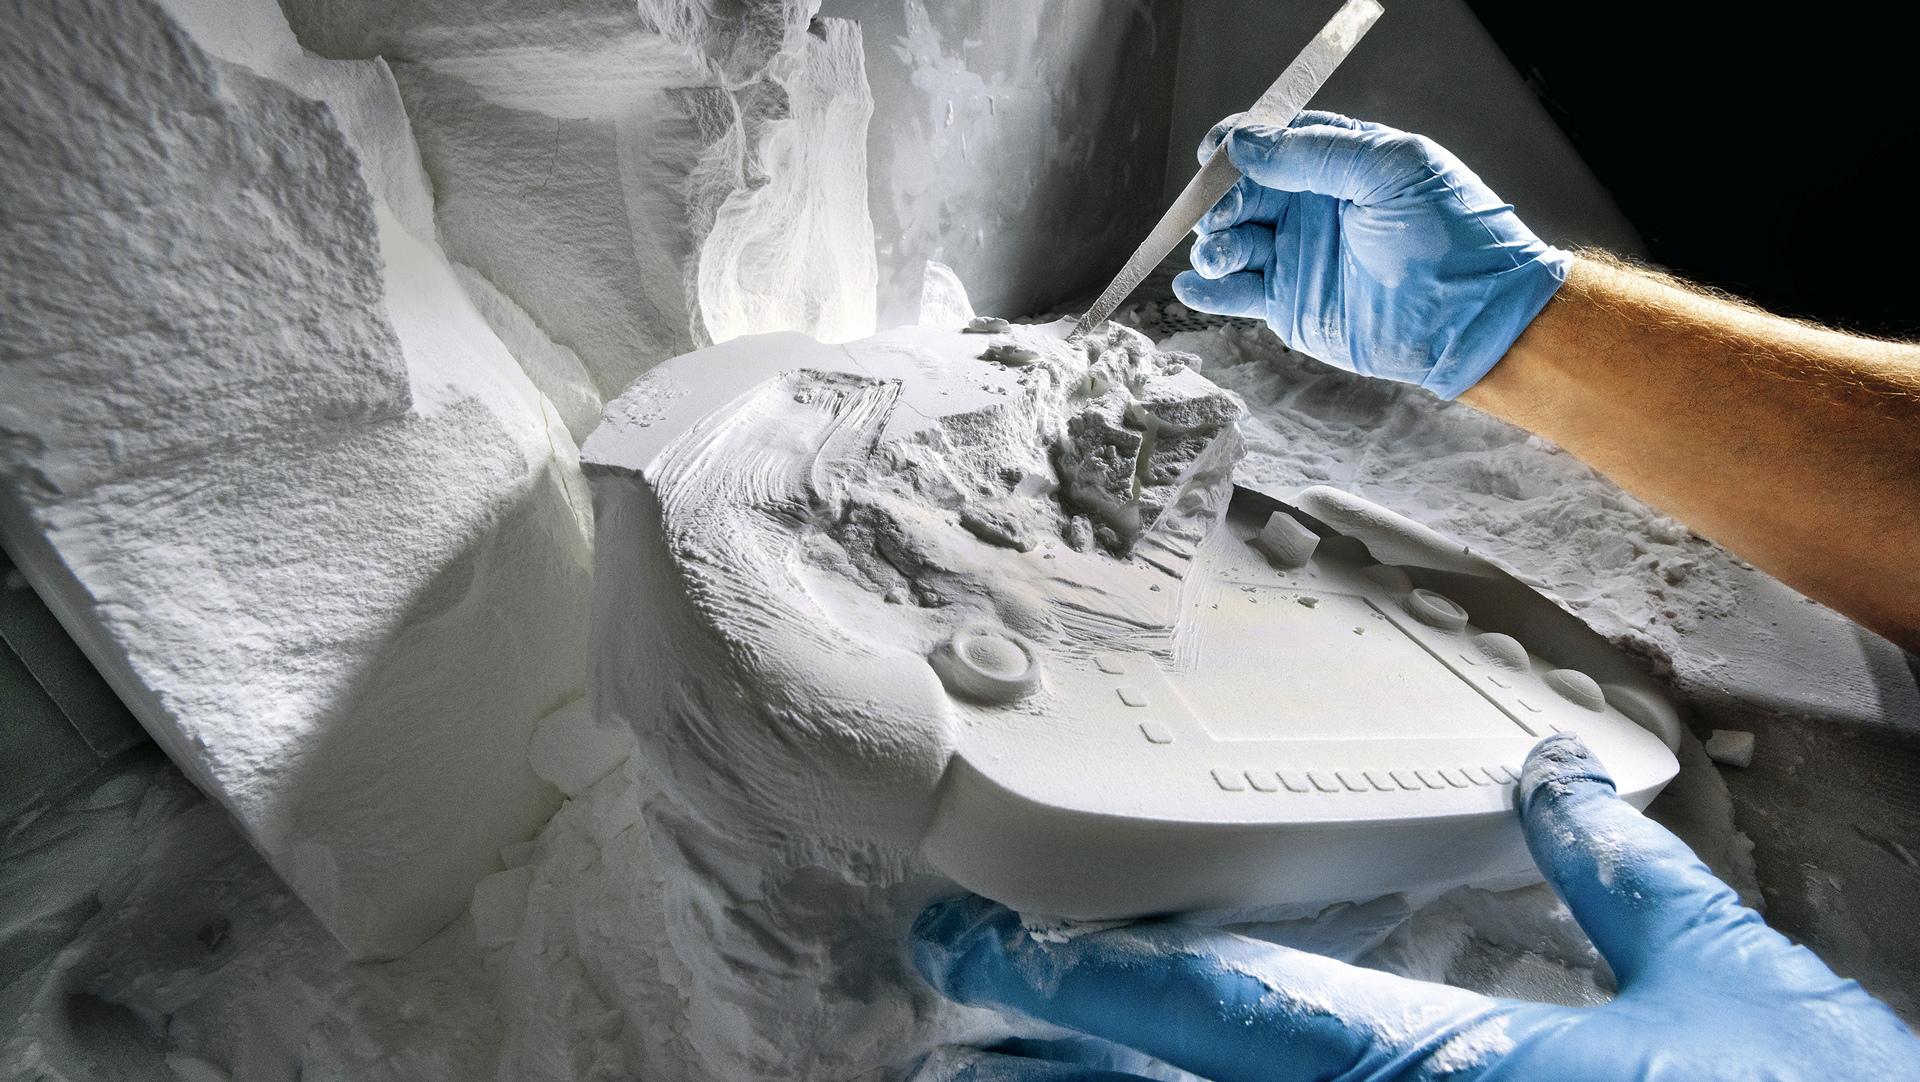 Formation of a 1-1 scale model, milling machine, Porsche Research & Development Centre, Weissach © Dr. Ing. h.c. F. Porsche AG